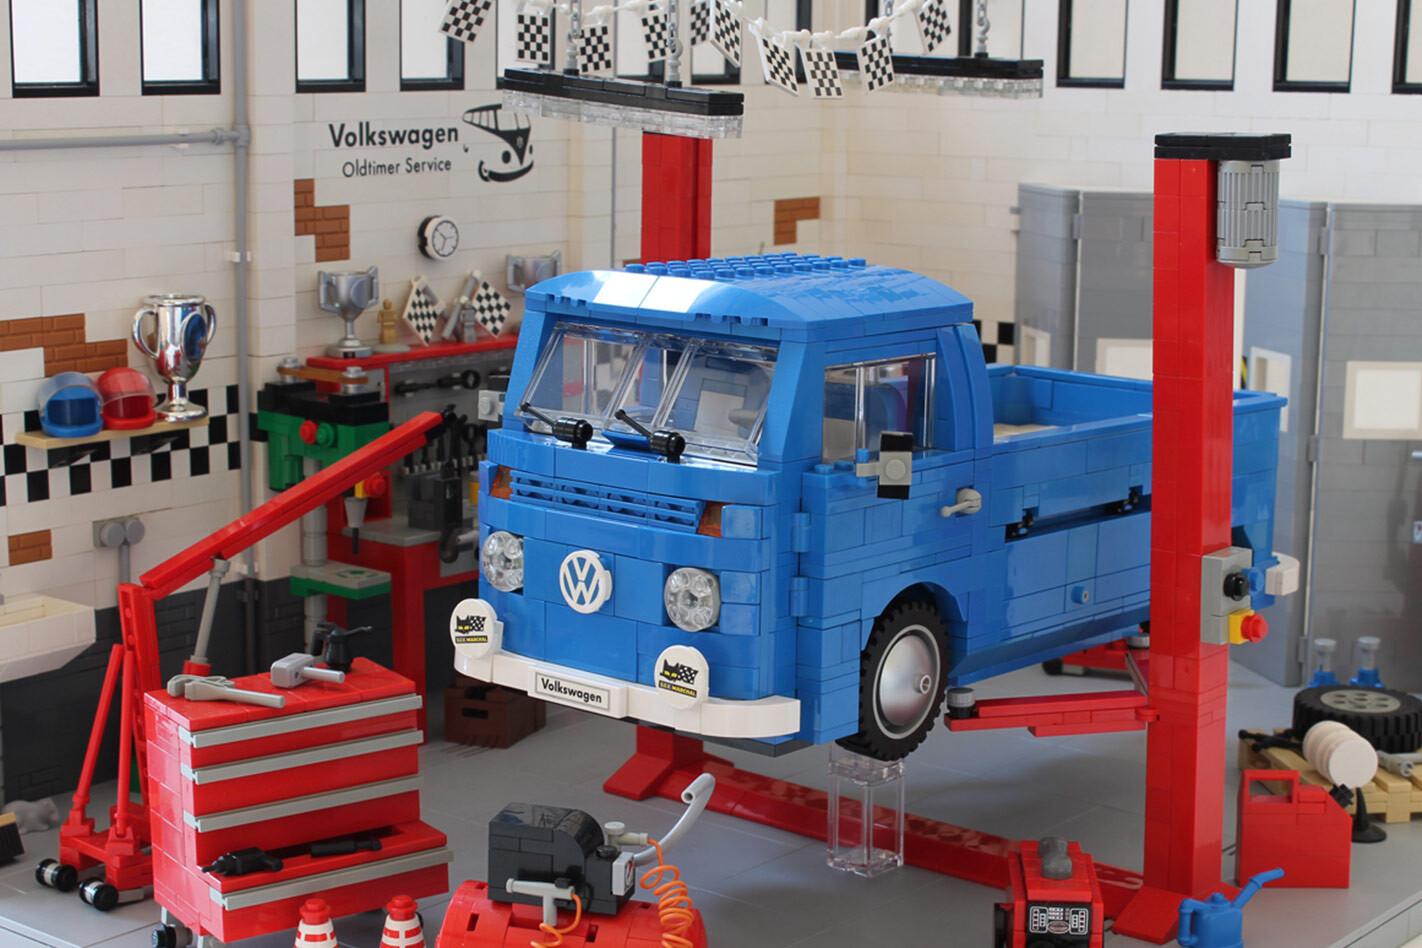 Lego VW ute